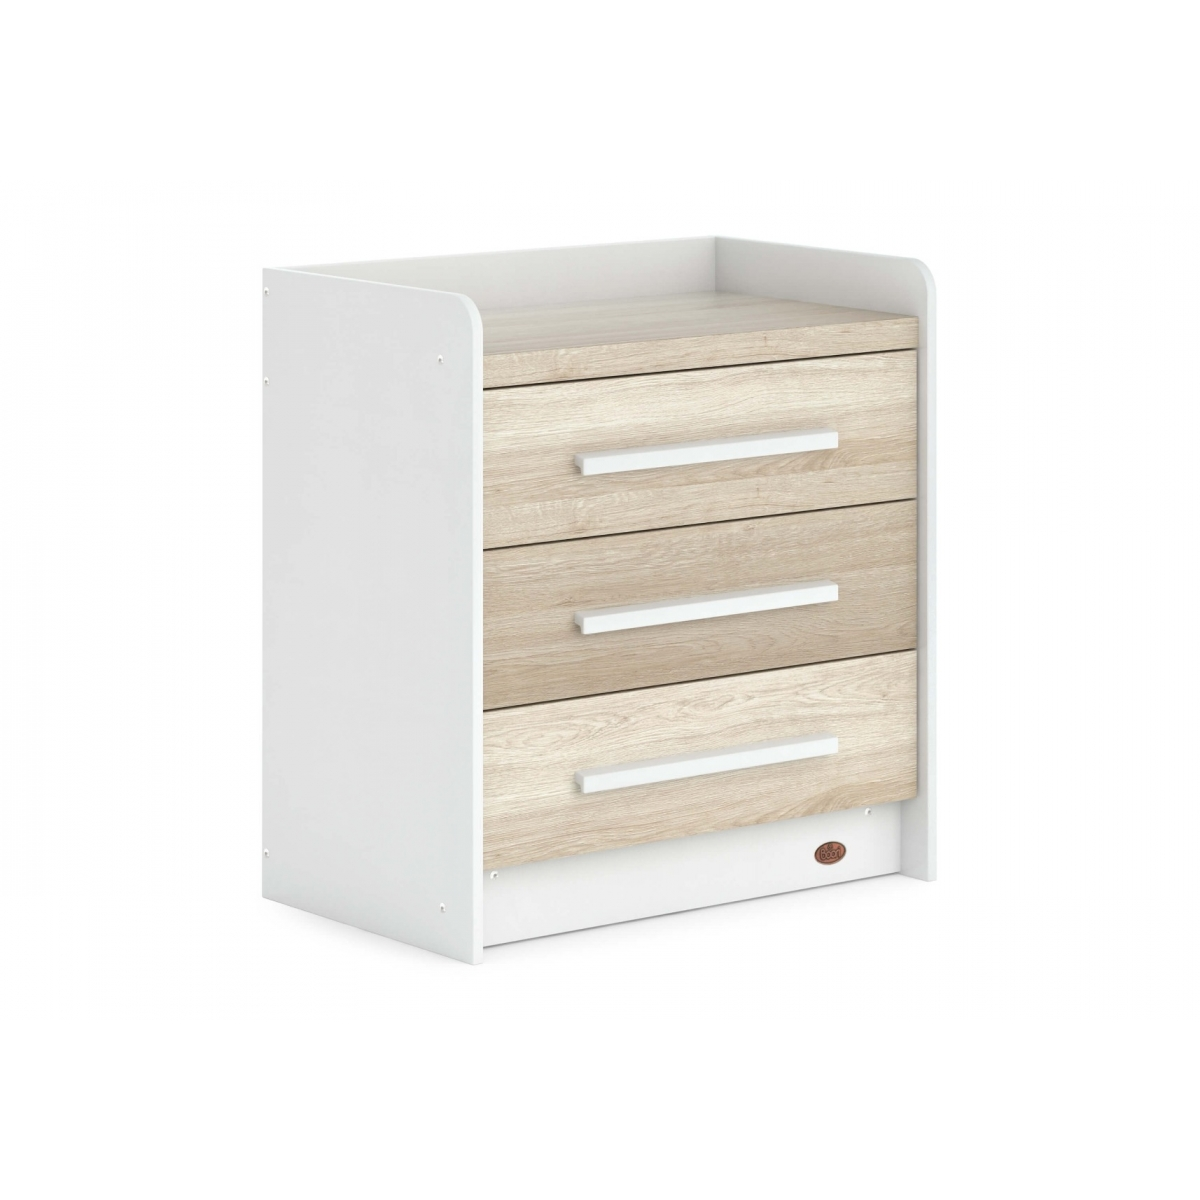 Boori Neat 3 Drawer Chest-White & Oak (2021)